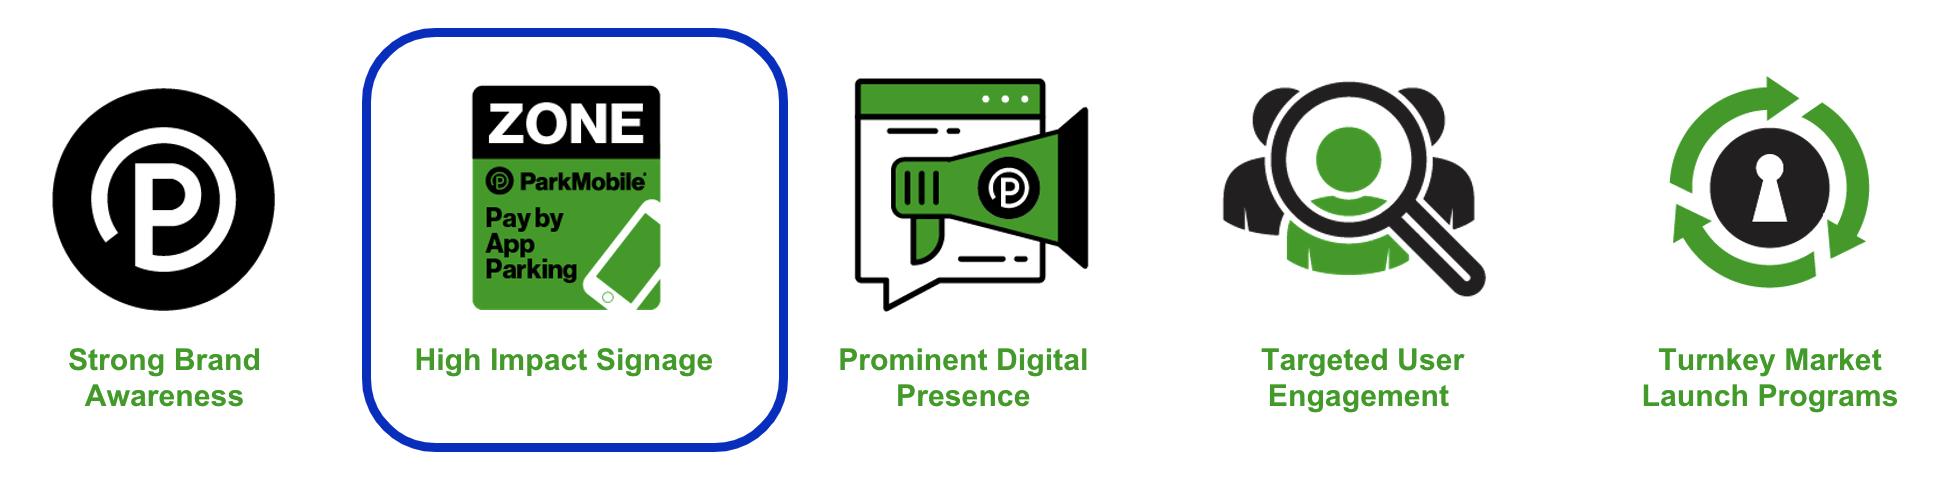 Highly Efficient Marketing Engine - ParkMobile